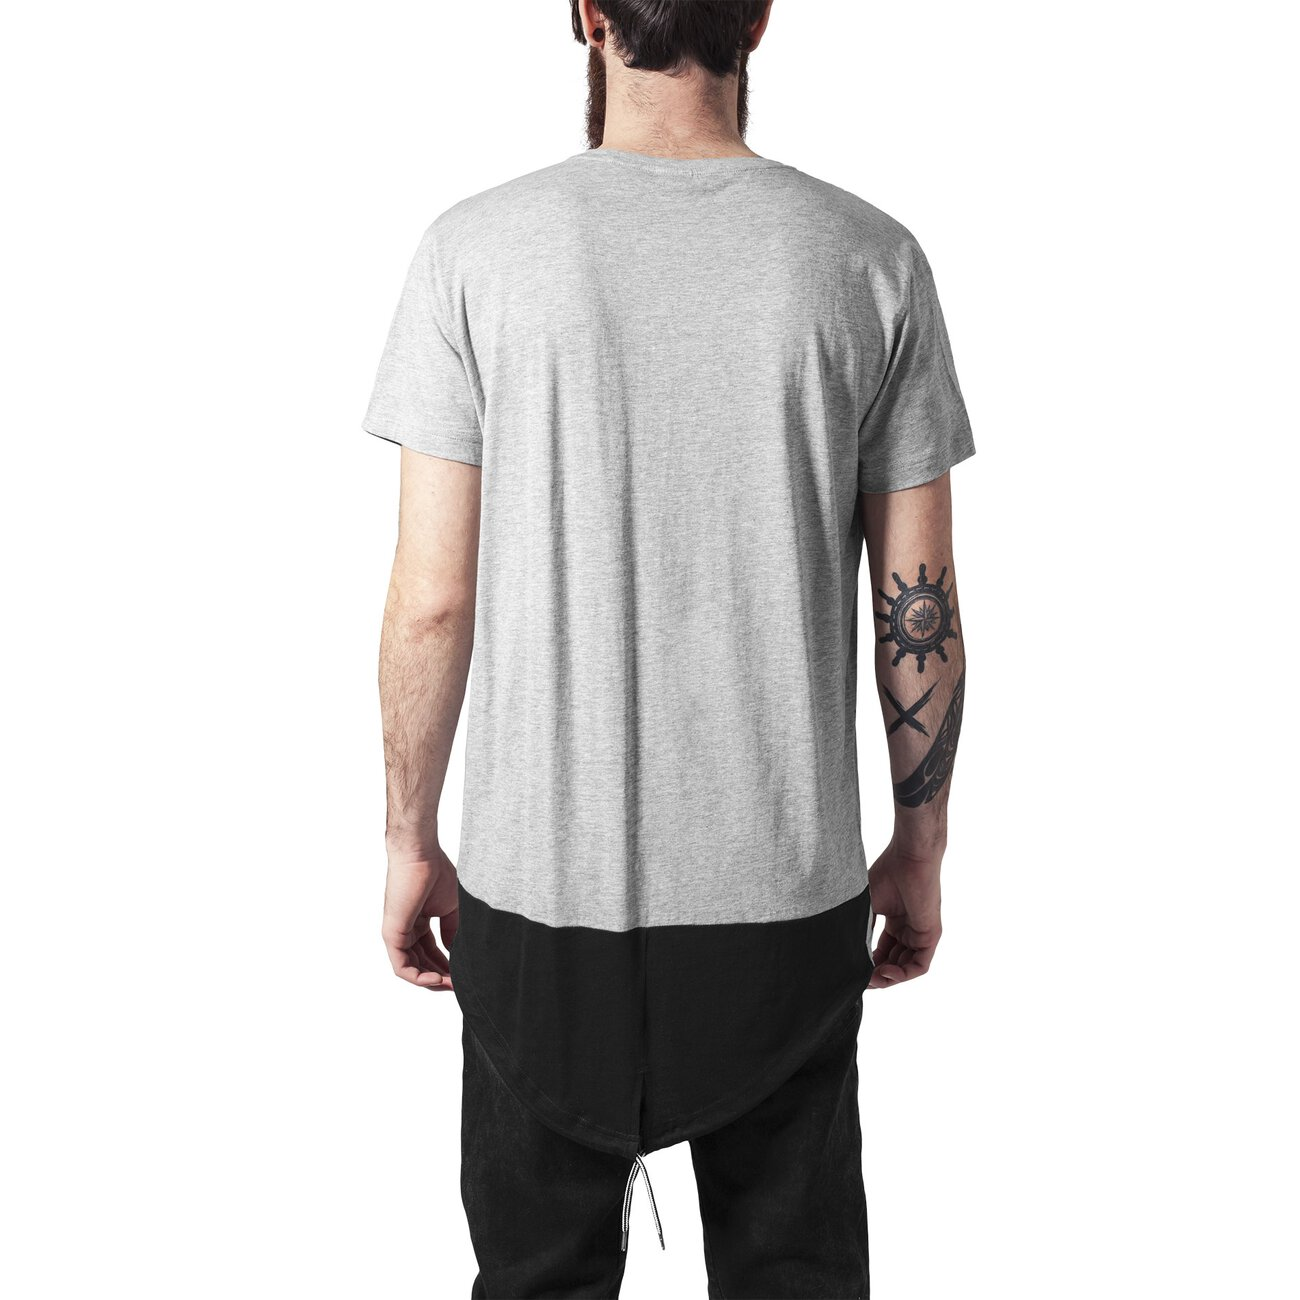 urban classics t shirt herren oversize long tail kurzarm shirt tb 122. Black Bedroom Furniture Sets. Home Design Ideas